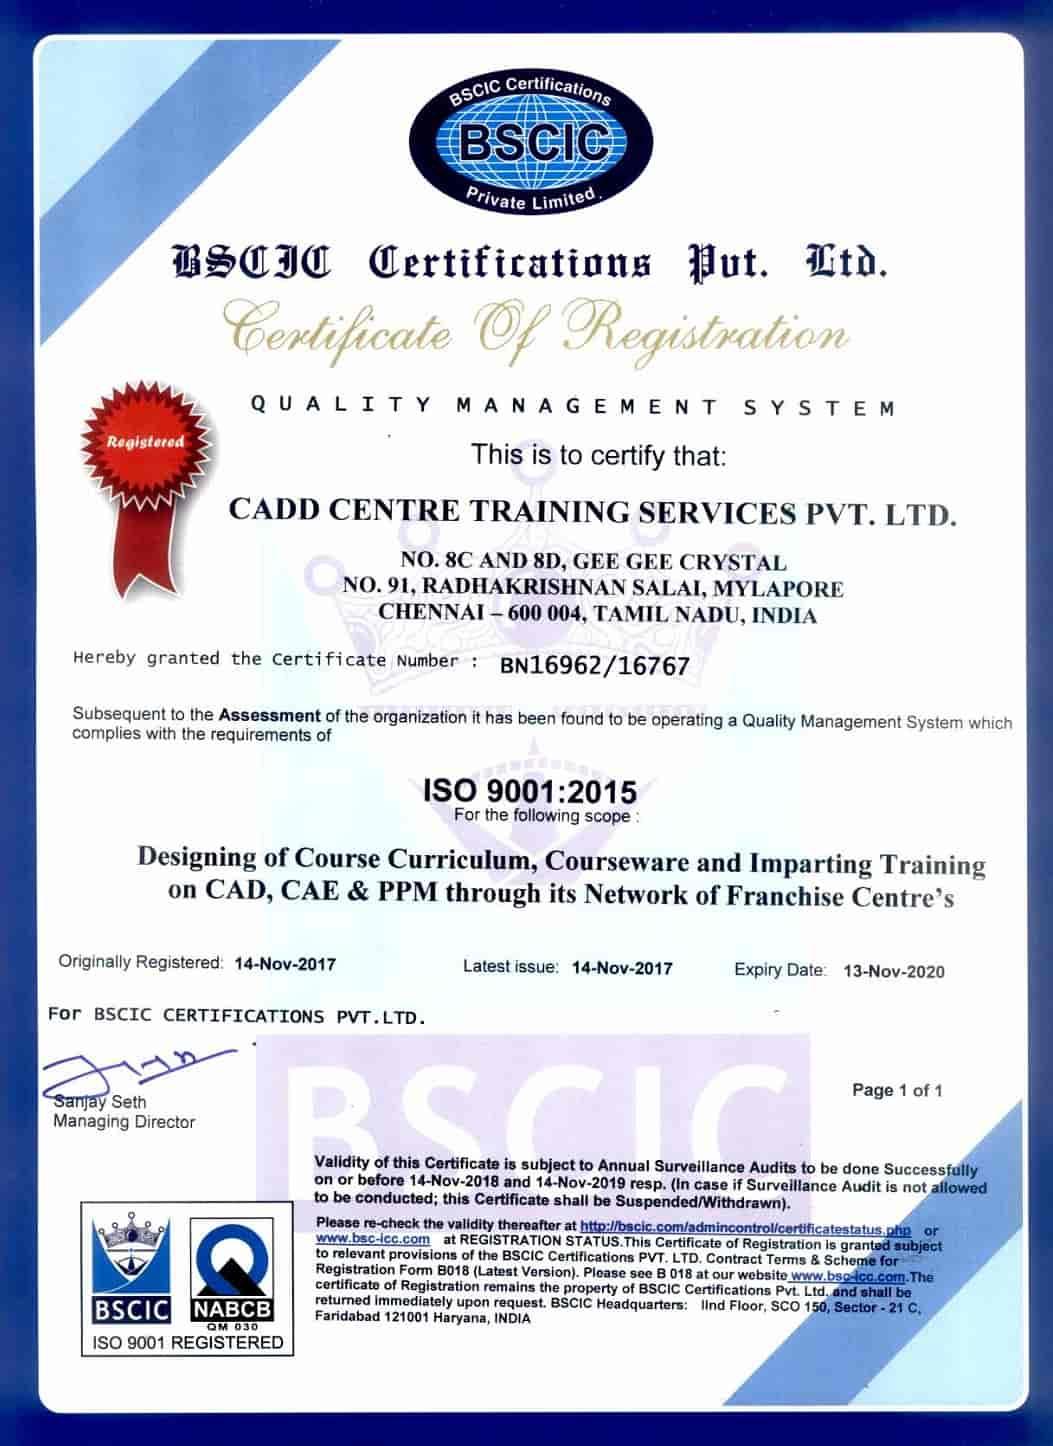 CADD CENTRE Training Services - Tiruppattur, Tirupattur